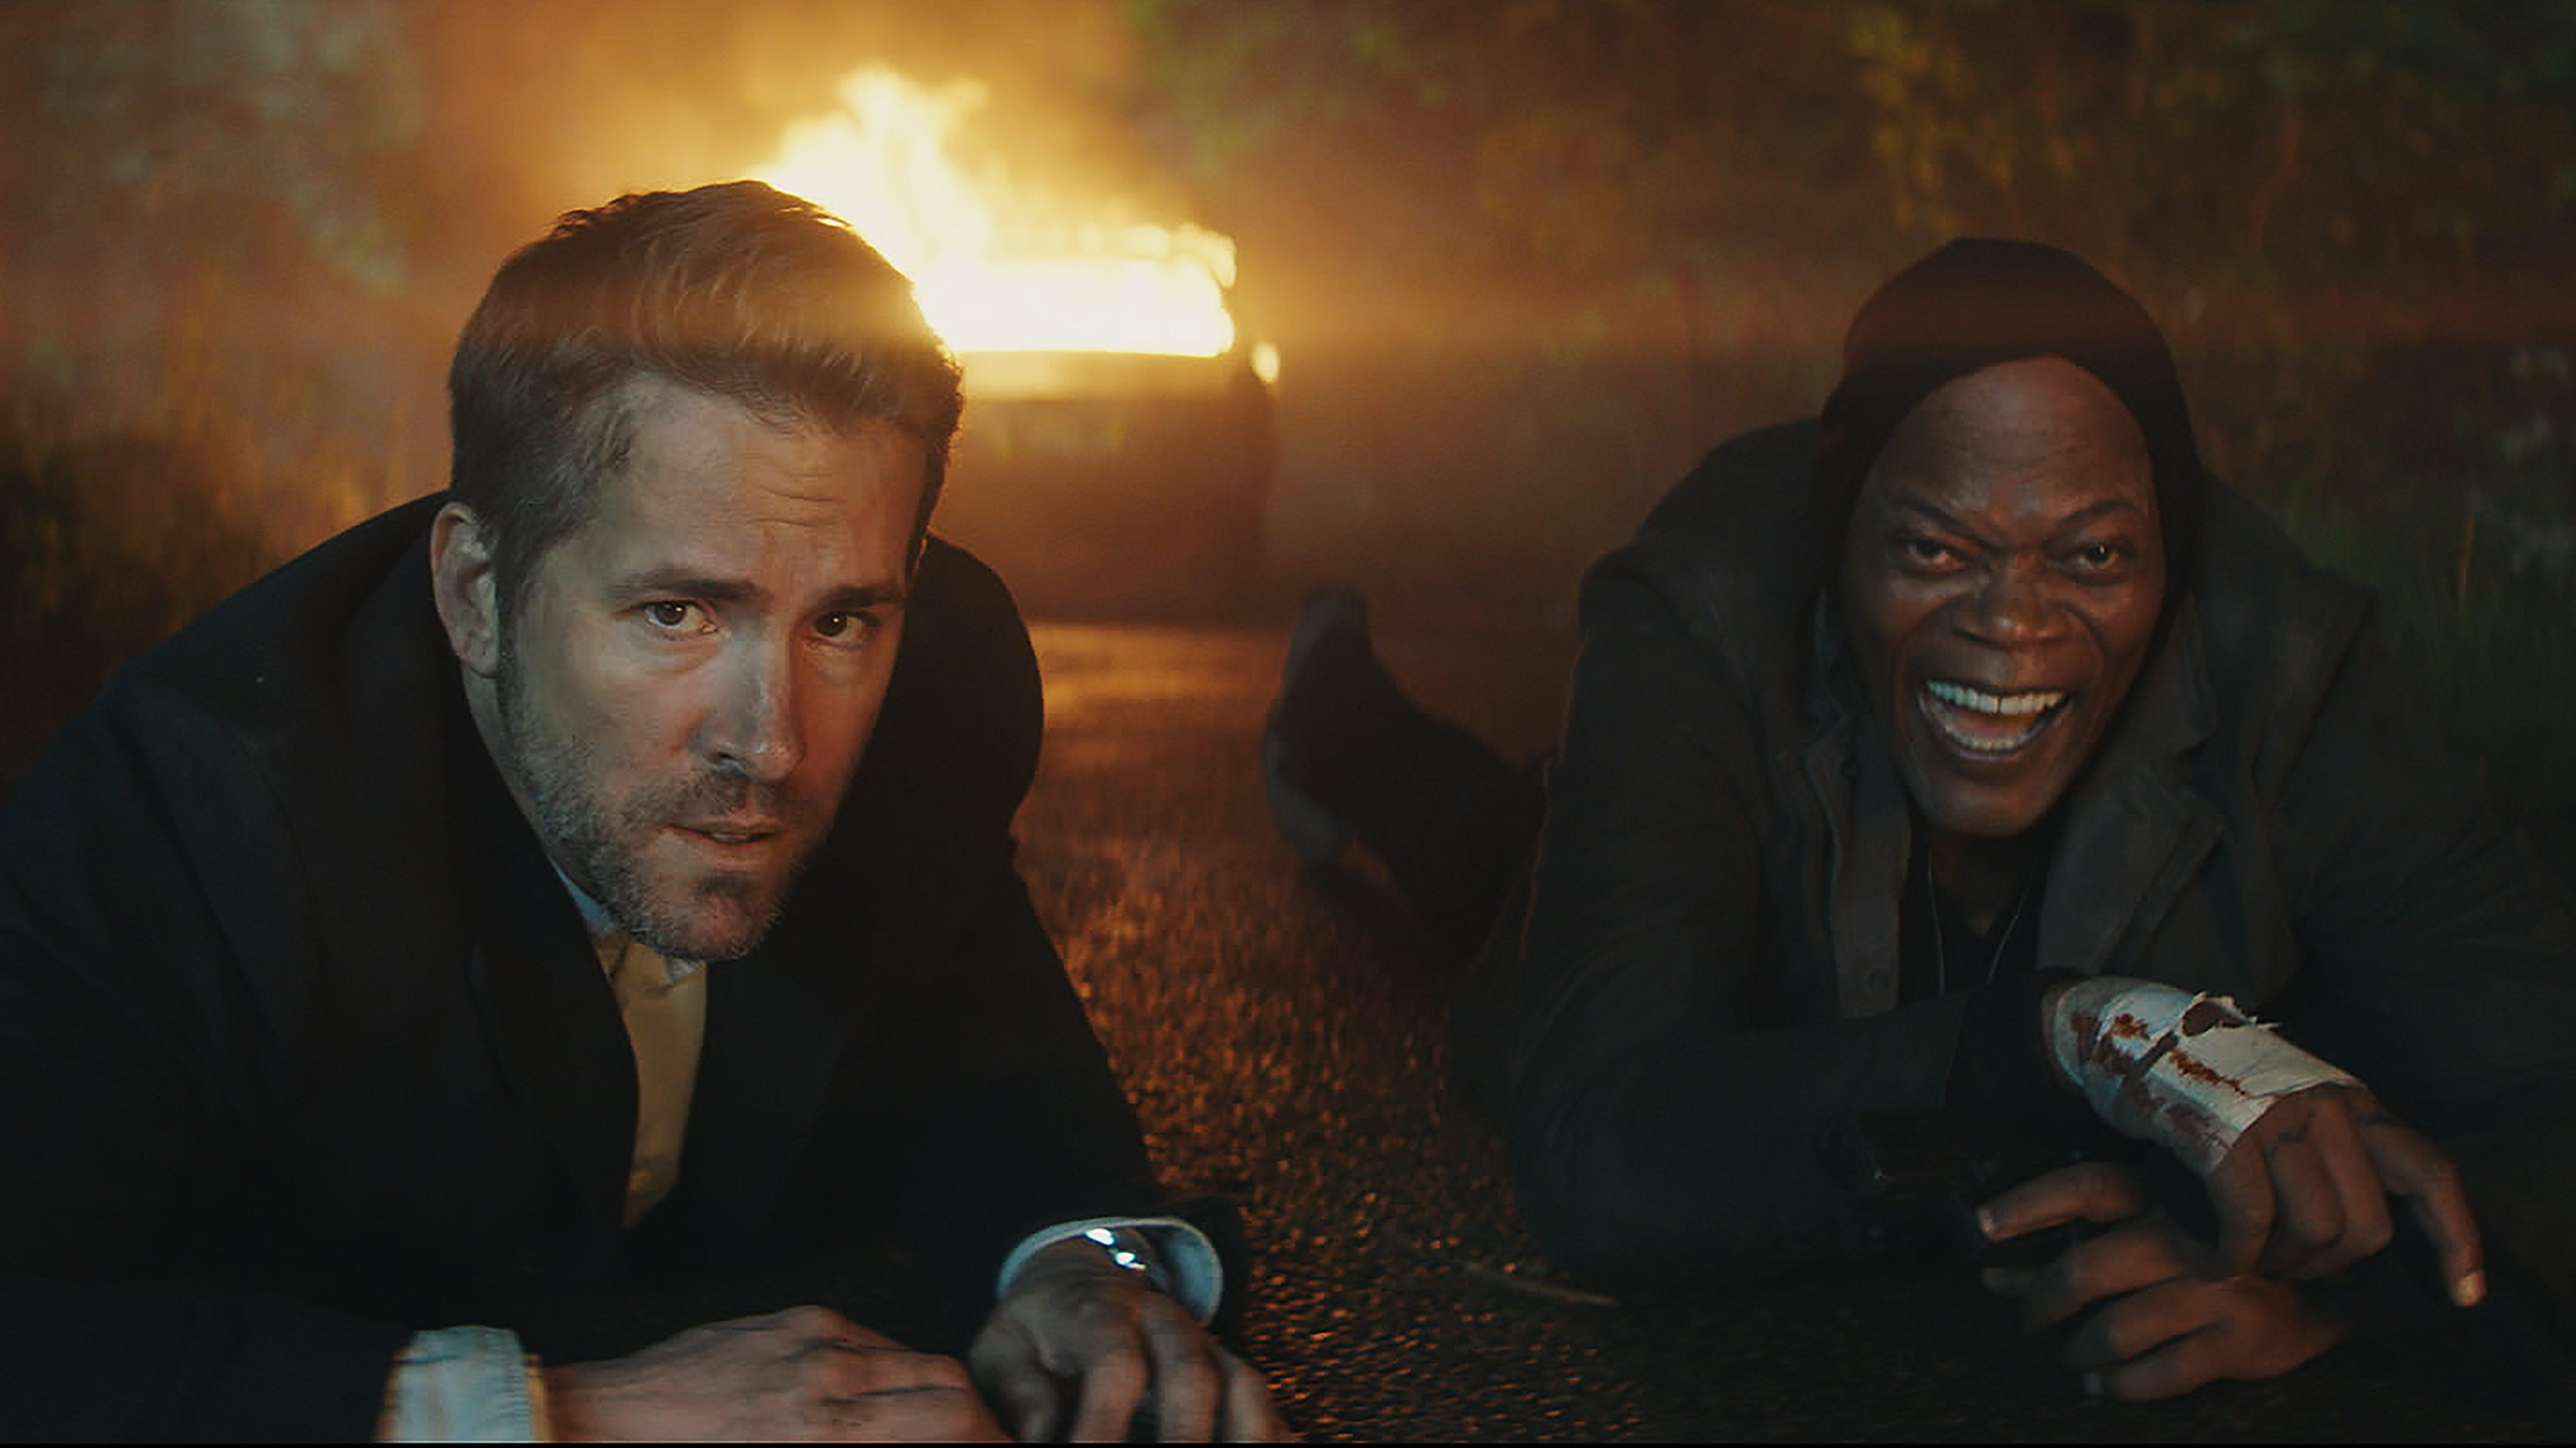 Michael Bryce (Ryan Reynolds) and Darius Kincaid (Samuel L. Jackson) in THE HITMAN'S BODYGUARD. Image Courtesy of Lionsgate Entertainment.